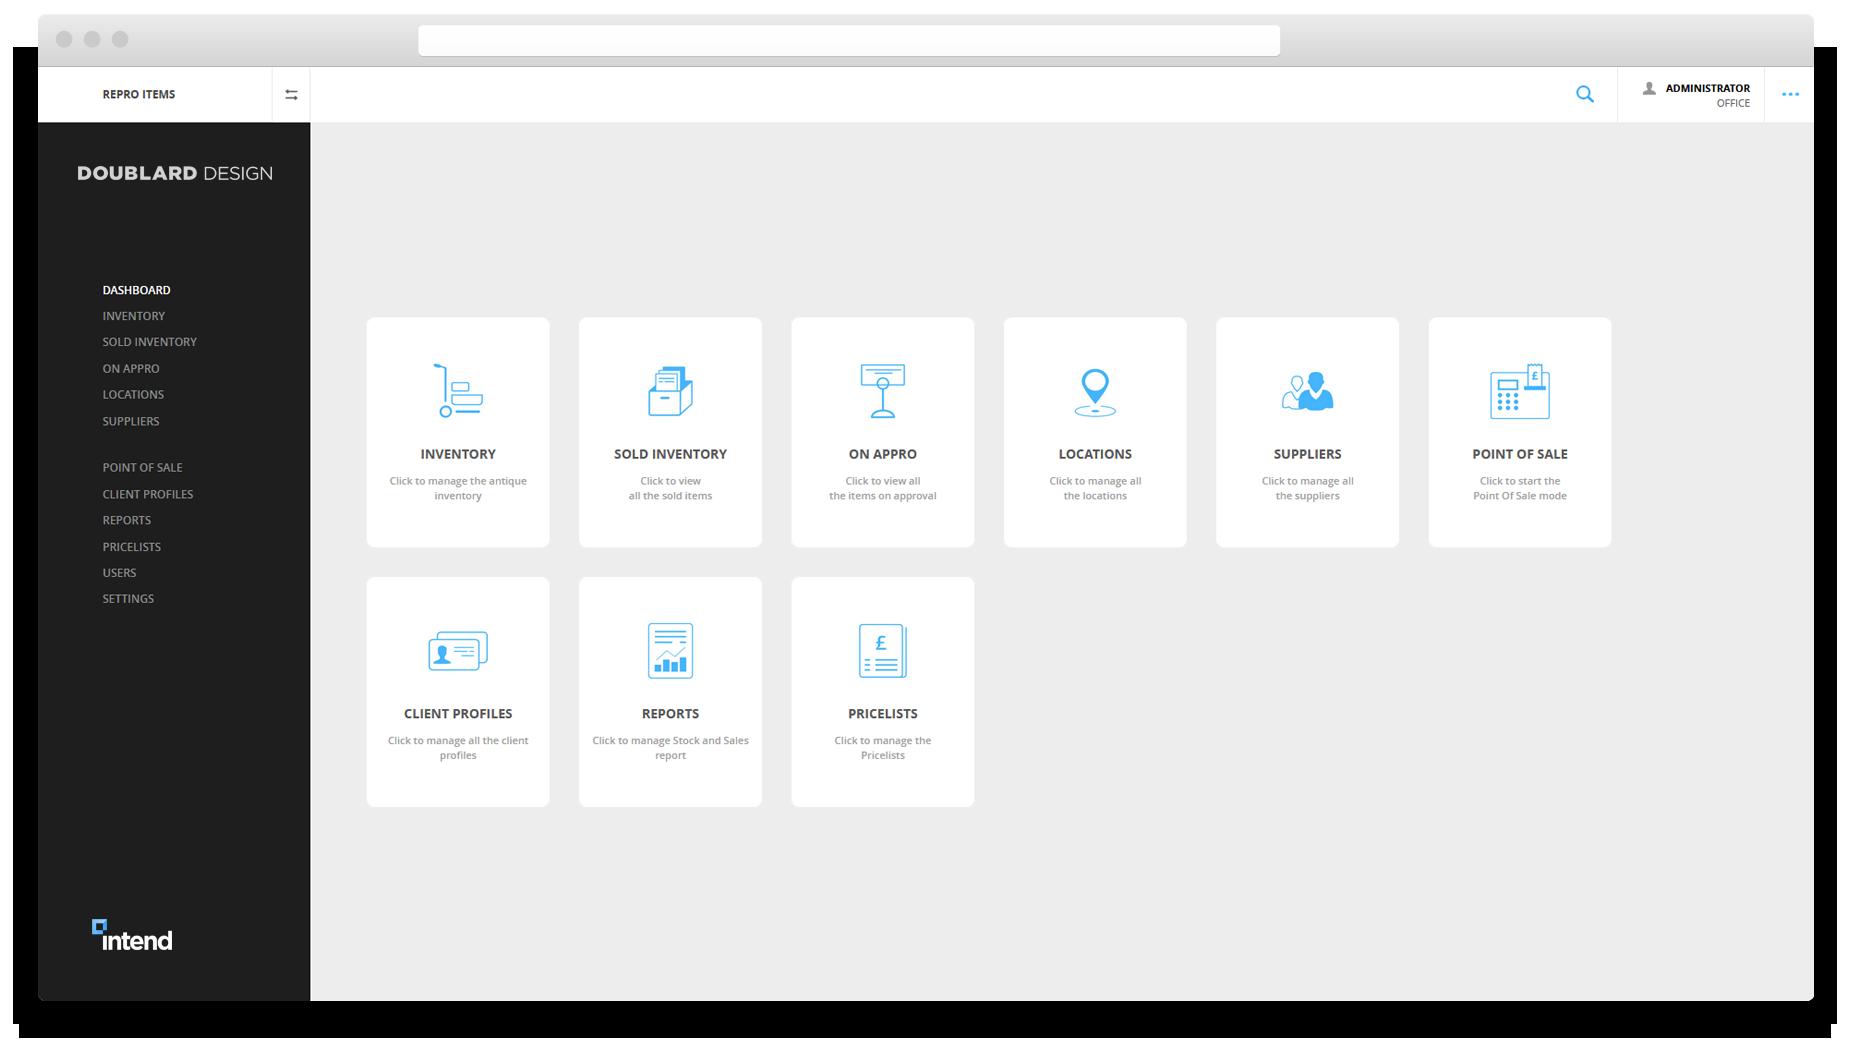 Doublard Design Bespoke Website Design And Development For The